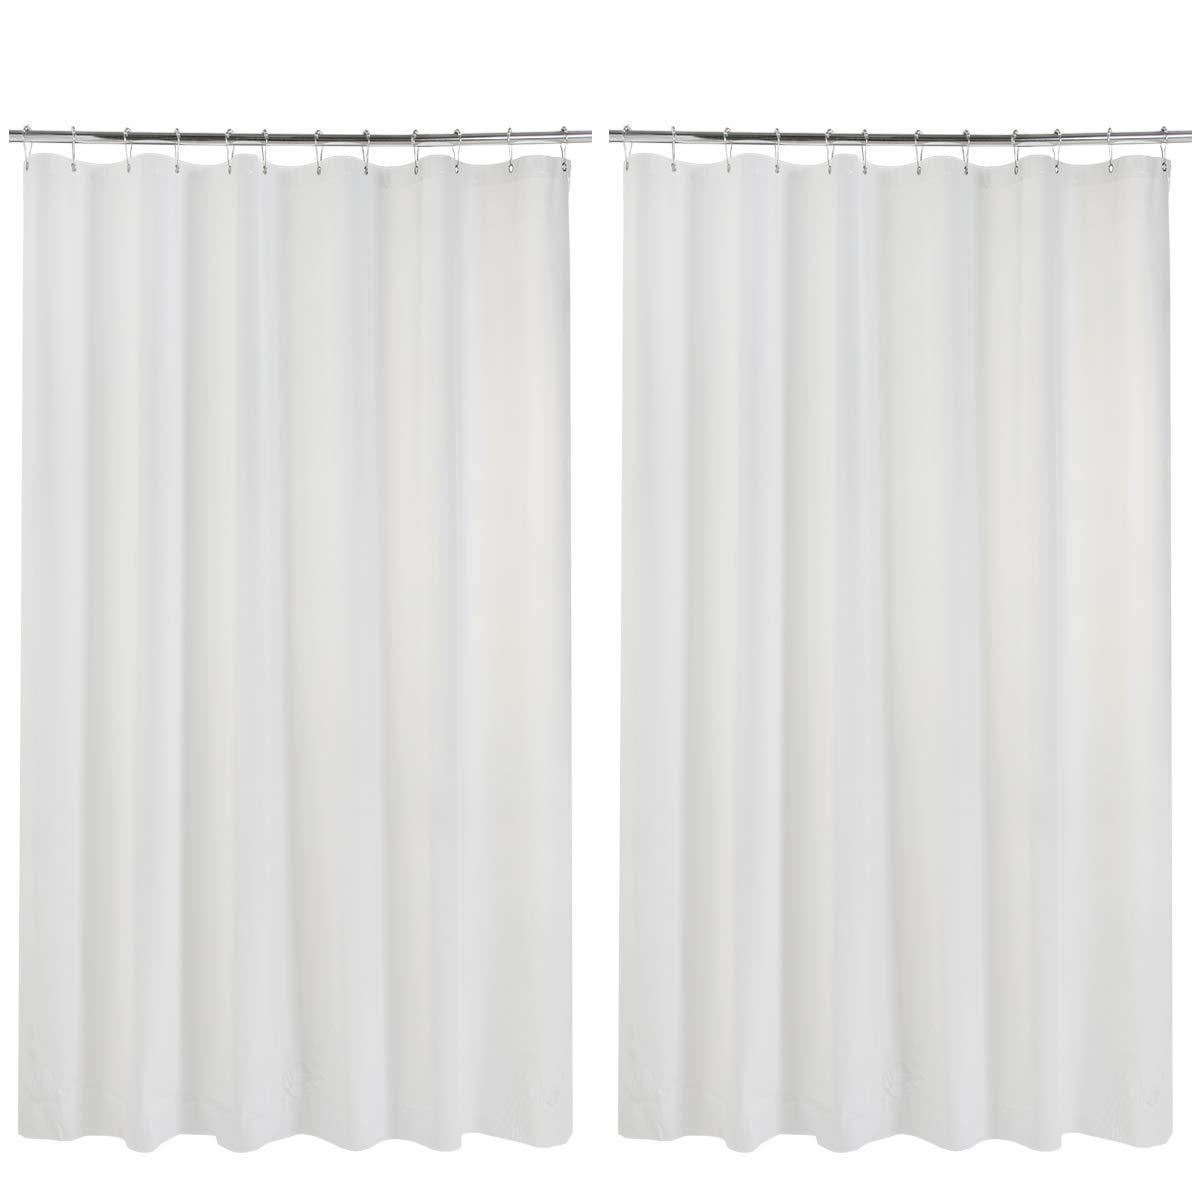 Amazer Curtain Curtains Rust Resistant Waterproof